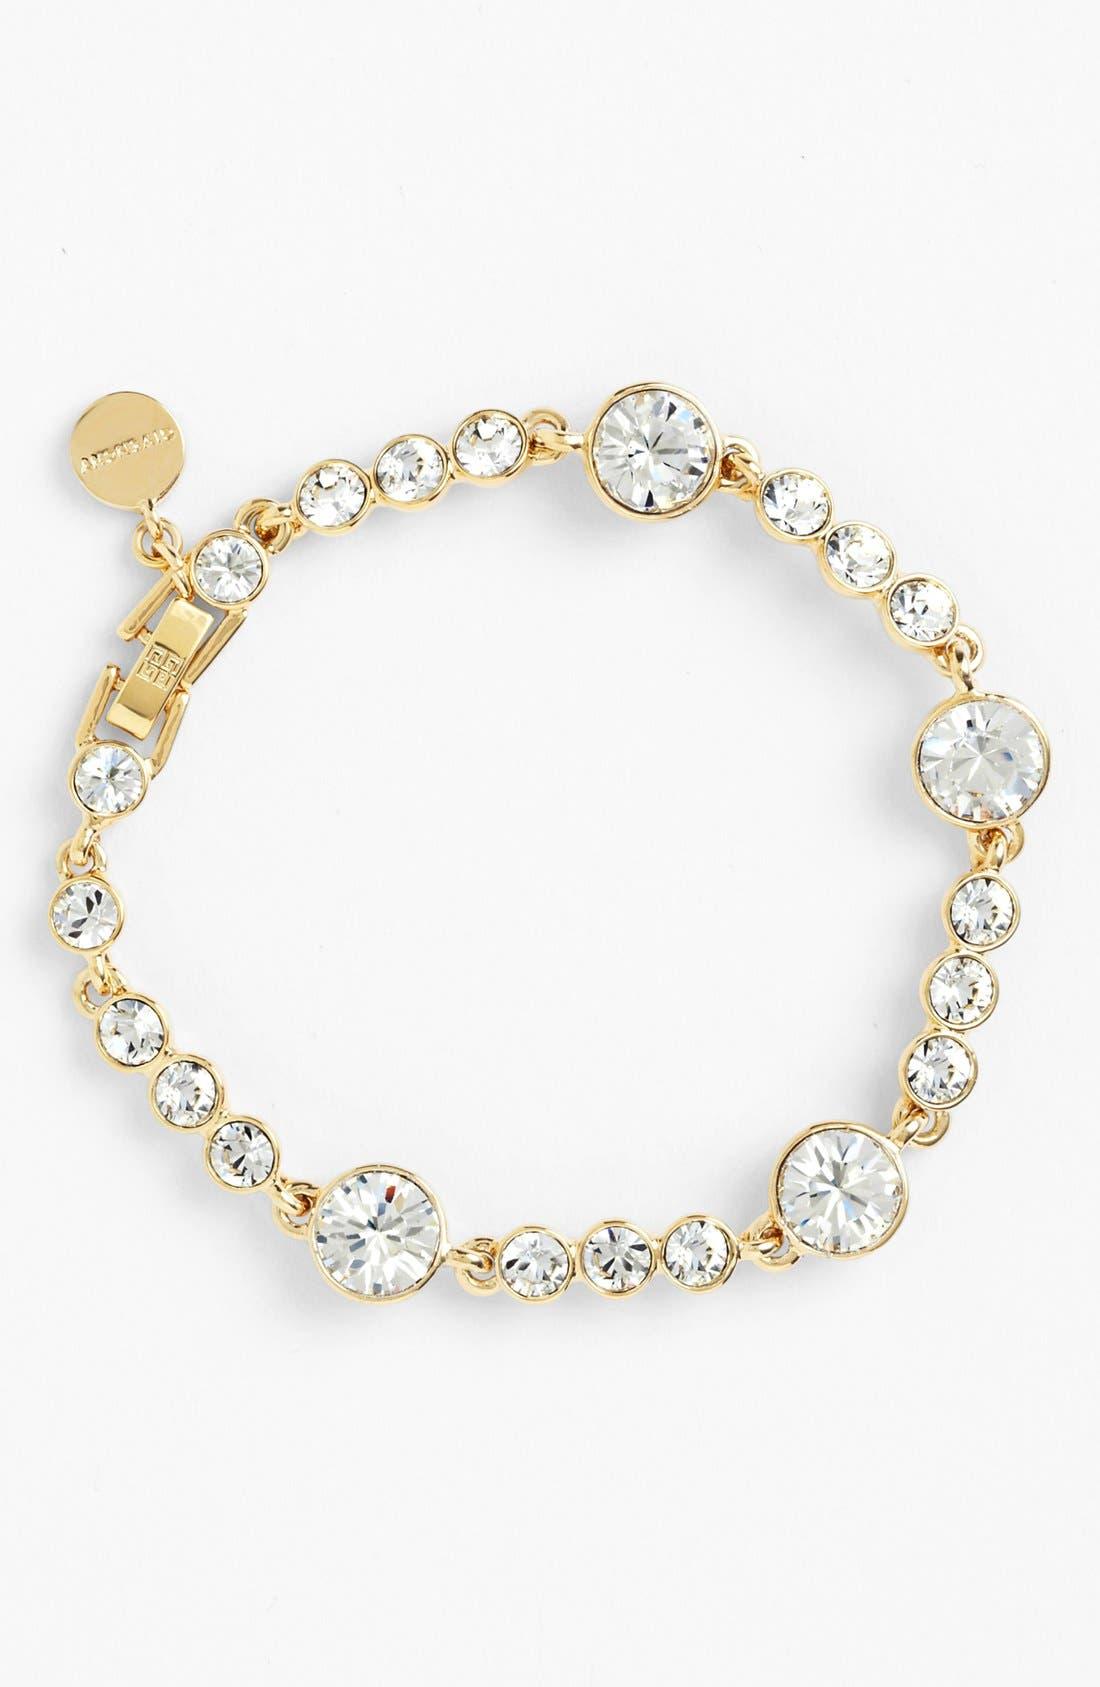 Alternate Image 1 Selected - Givenchy Line Bracelet (Nordstrom Exclusive)